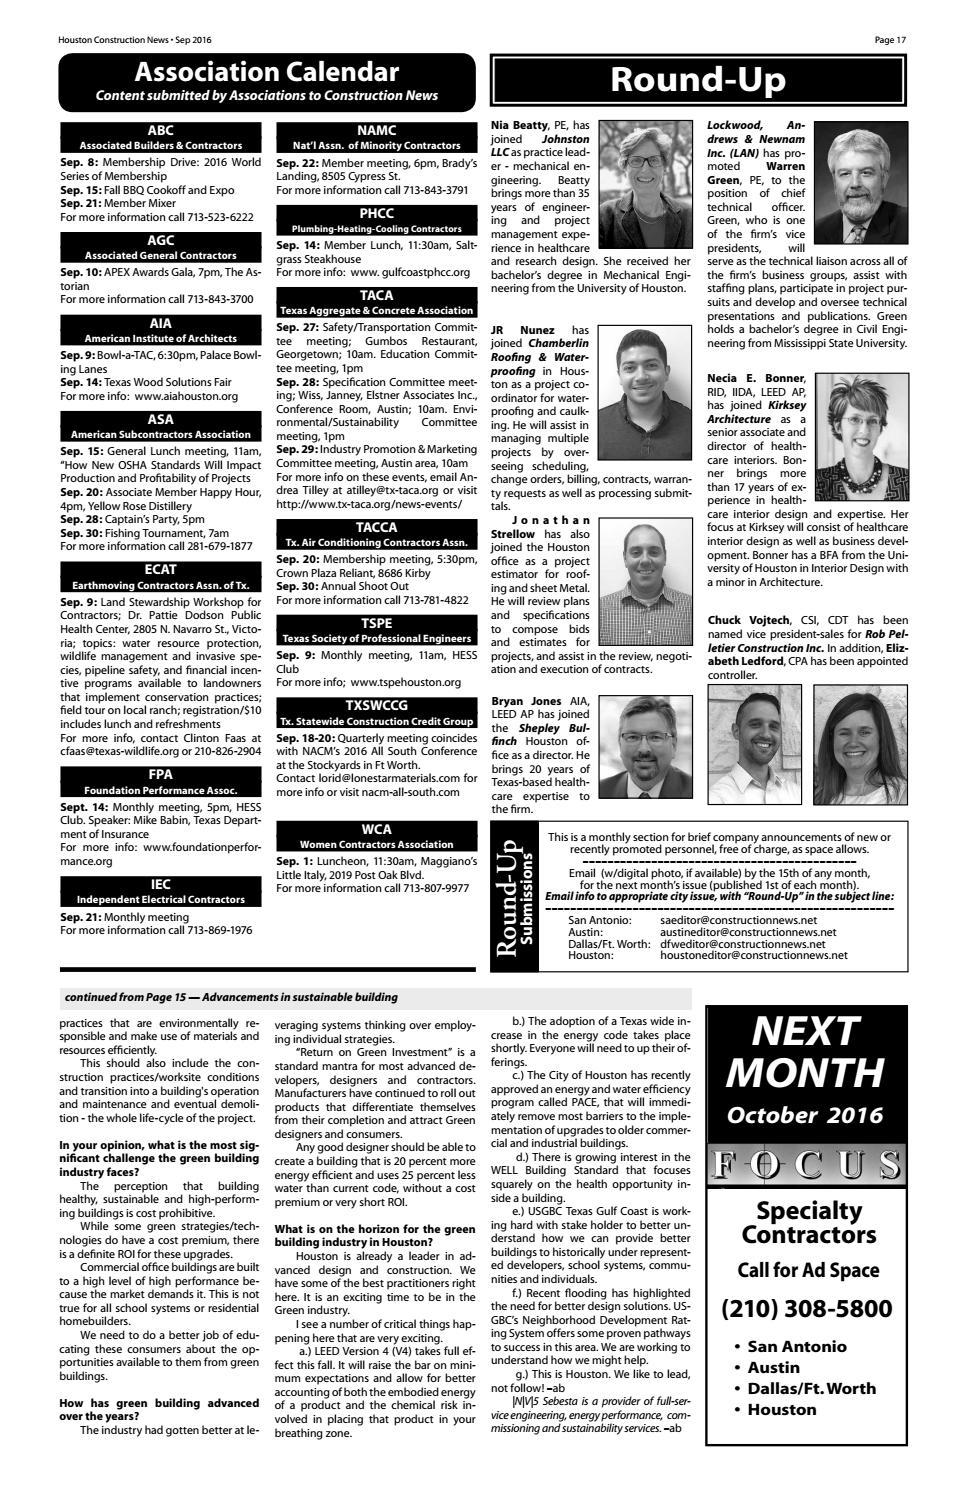 Houston Construction News September 2016 by Construction News, Ltd